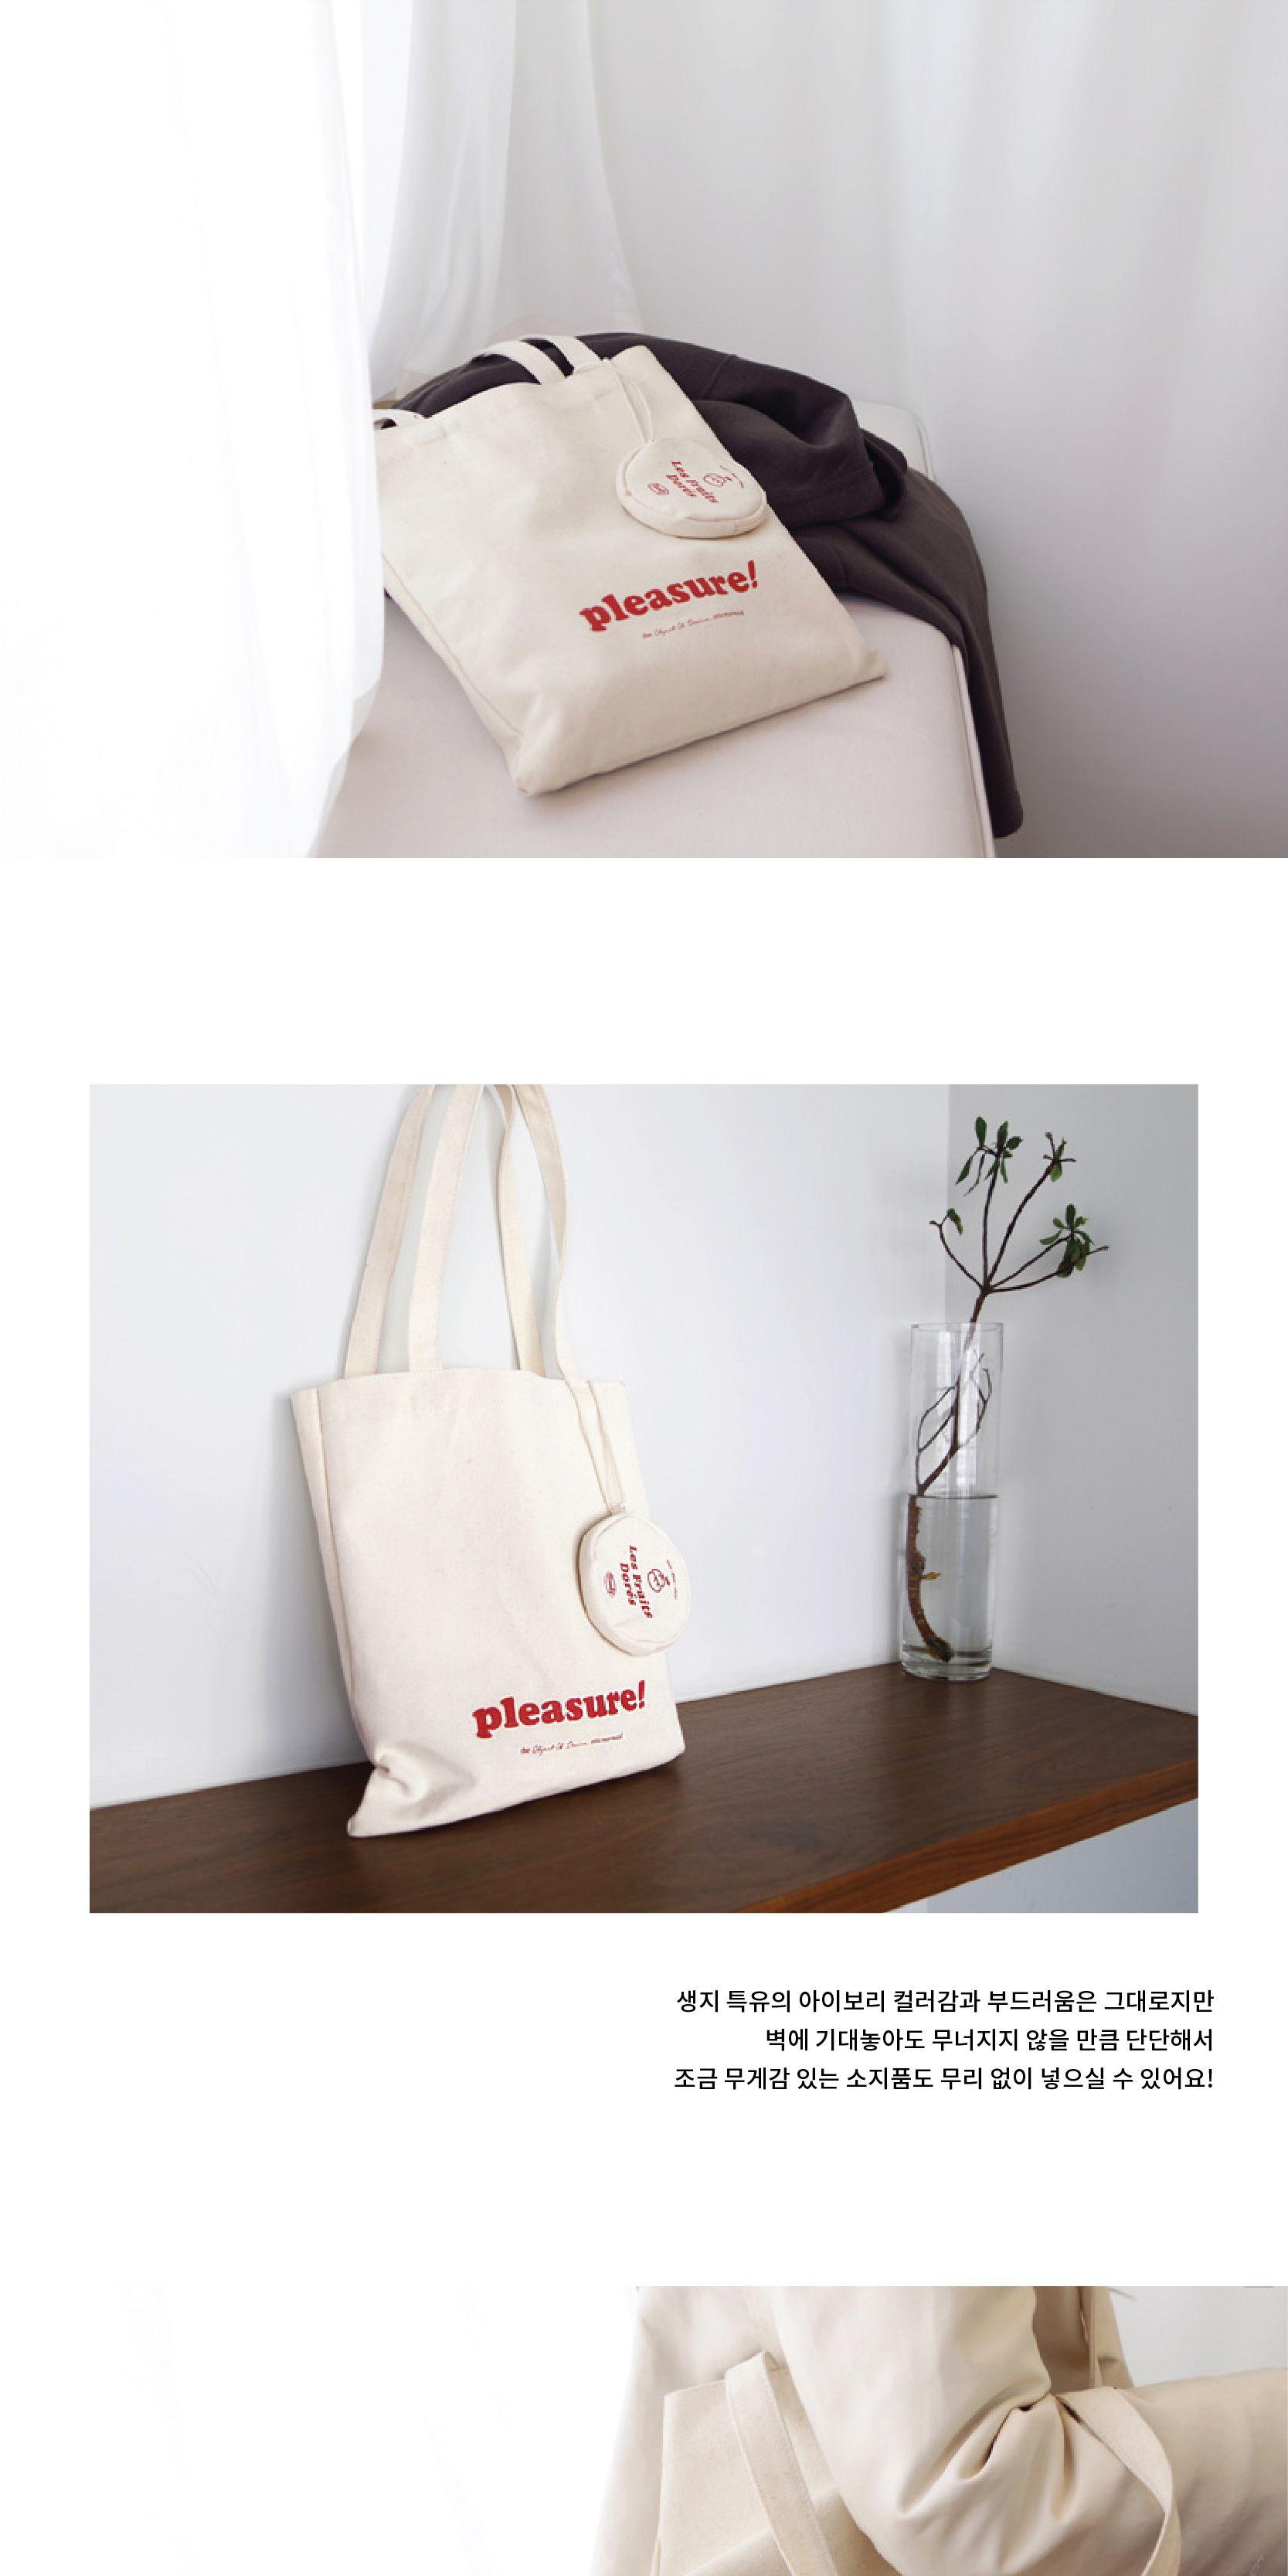 10x10 프룻 픜레져 백 fruits pleasure bag_ 휜우치 포함 캔버욤 백 토횸